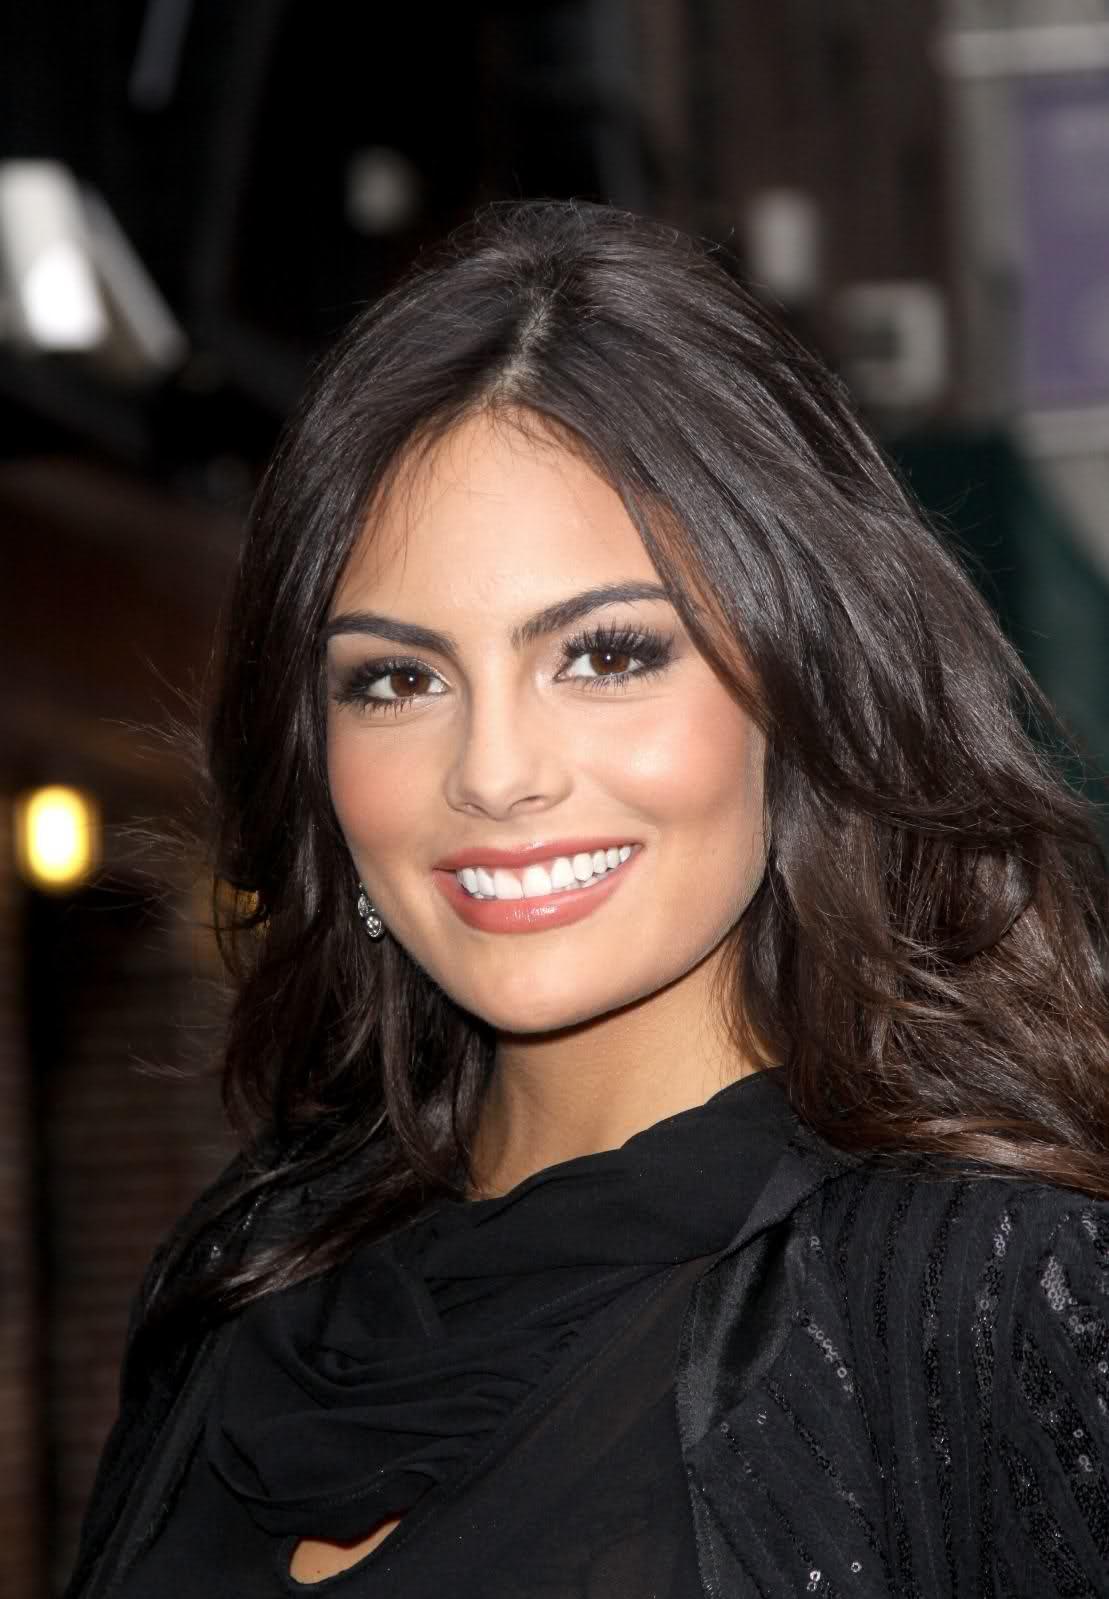 Ximena Navarrete Net Worth